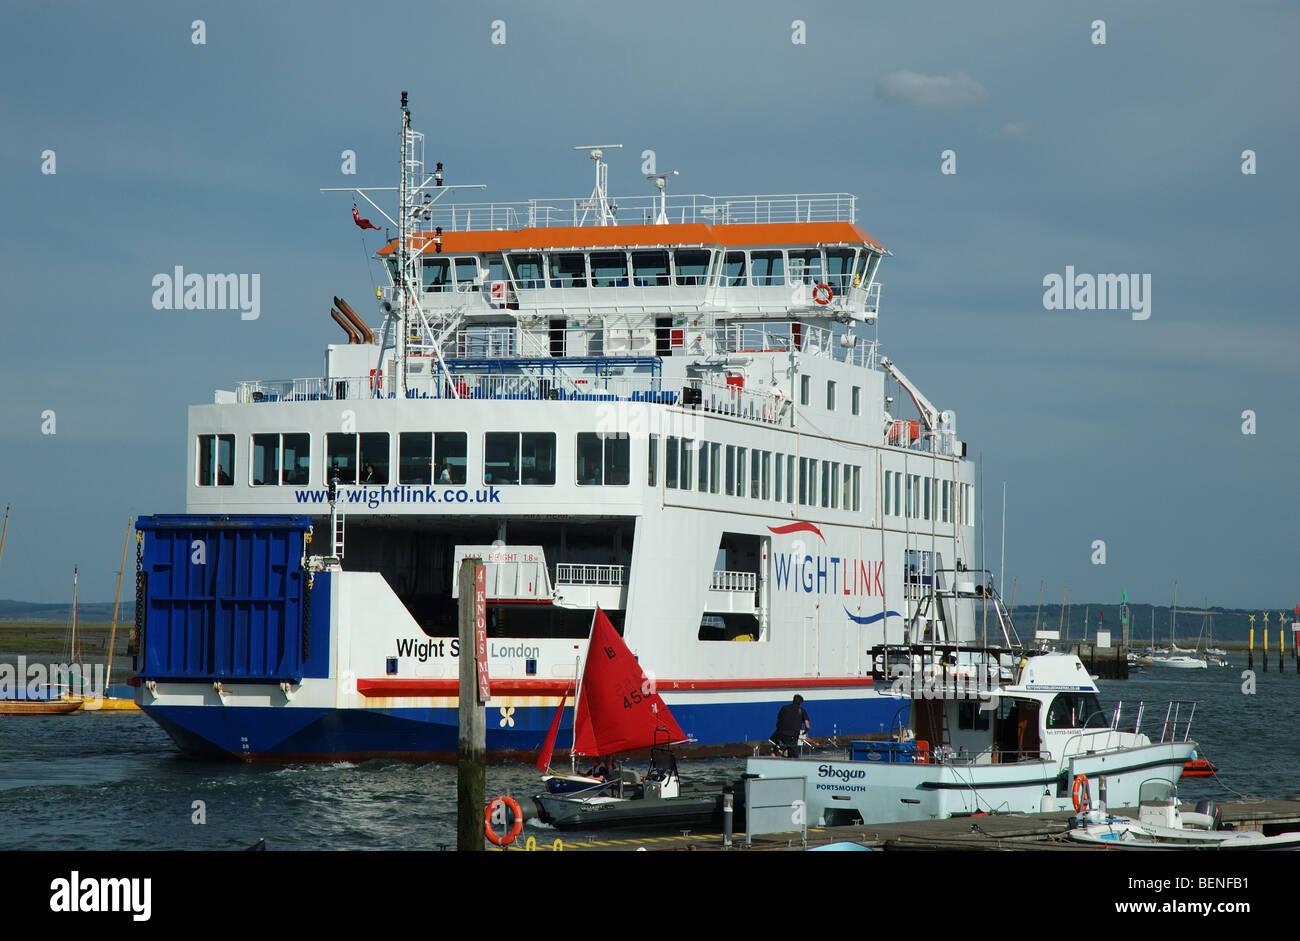 Isle of Wight, Wightlink, ferry departs Lymington, Hampshire, England, UK - Stock Image